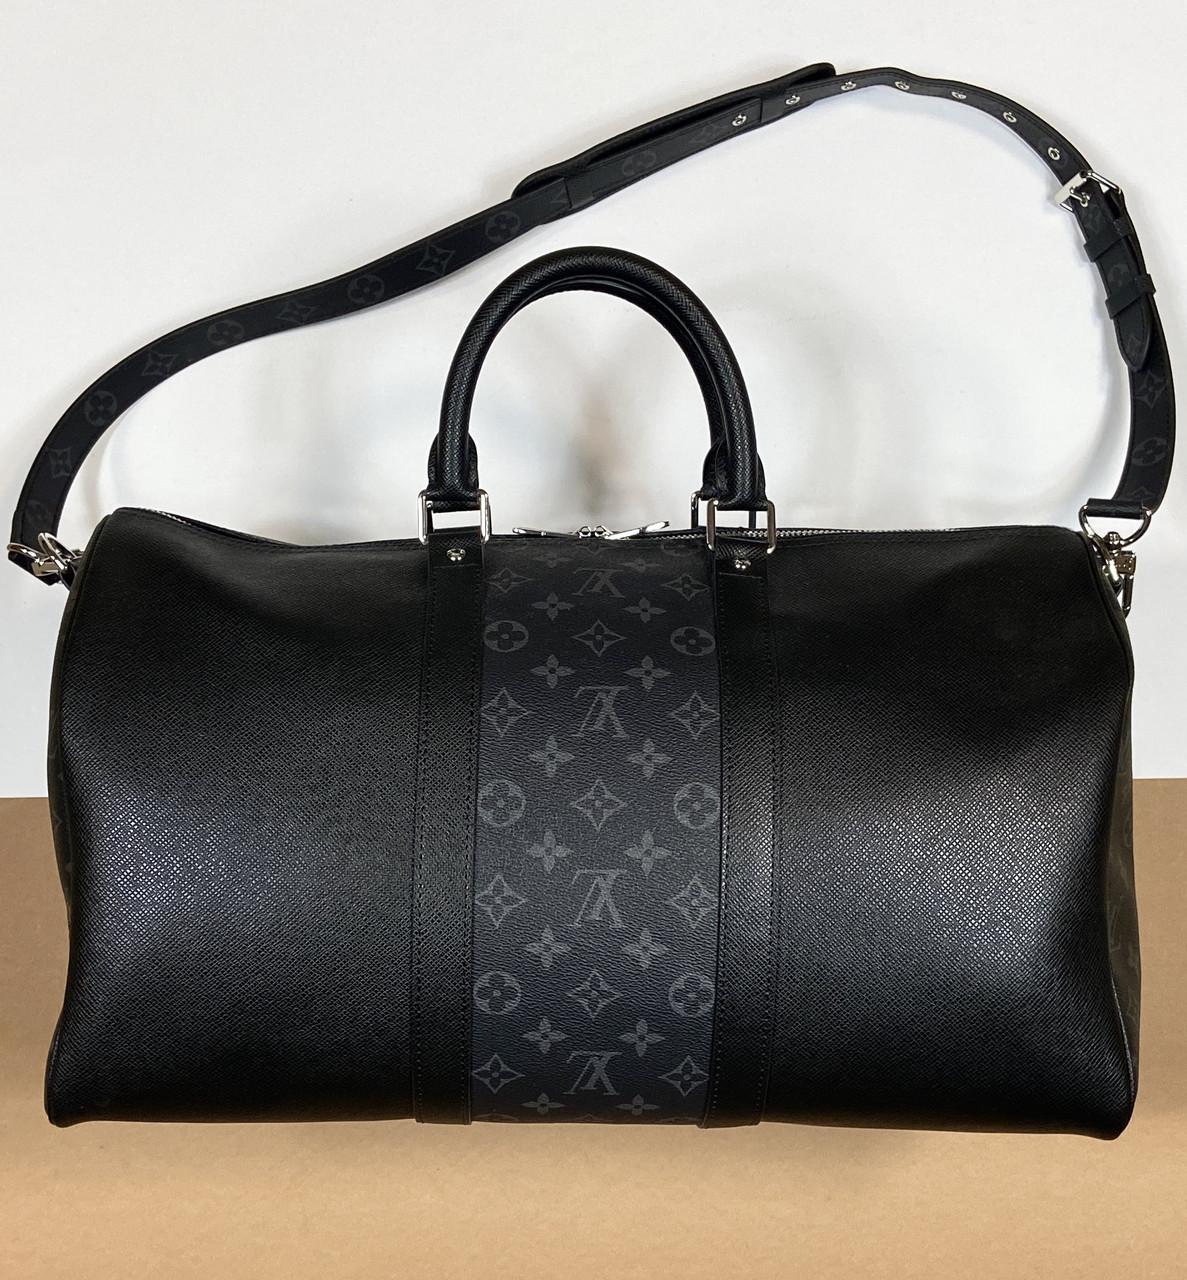 Дорожная сумка Louis Vuitton Keepall 45 (Луи Виттон Кепал) арт. 03-16